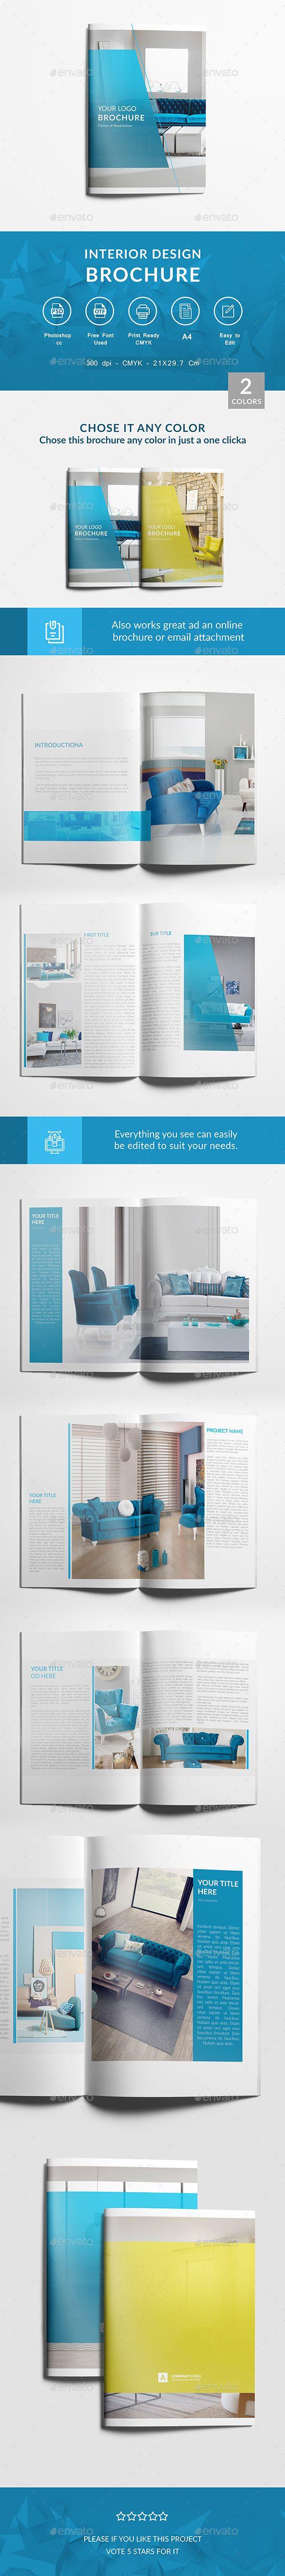 Interior Design Brochure A4 Template PSD